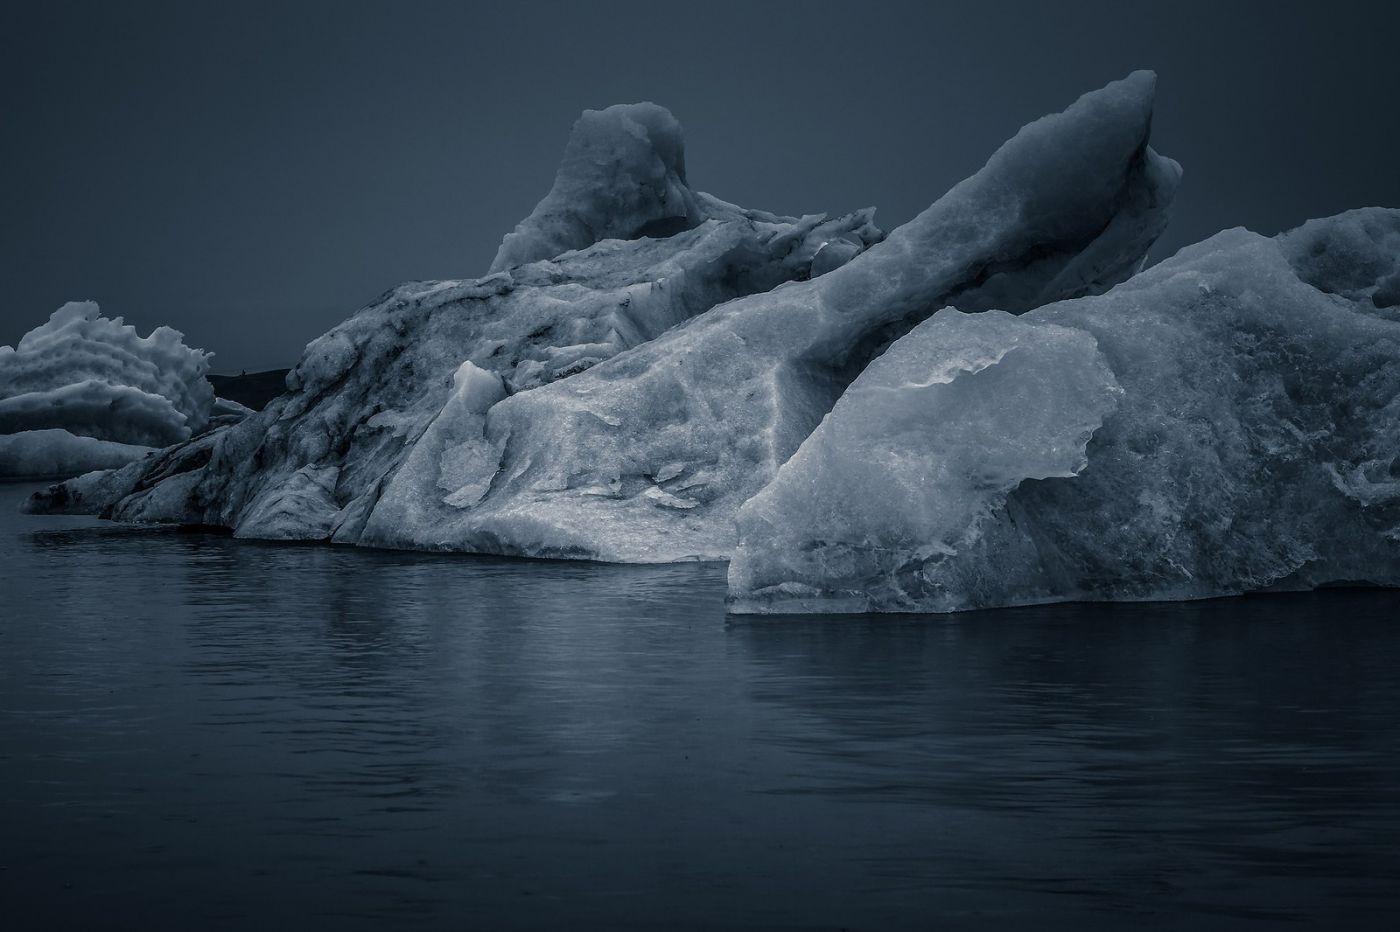 冰岛冰川泻湖(Glacier Lagoon),流动的冰川_图1-16